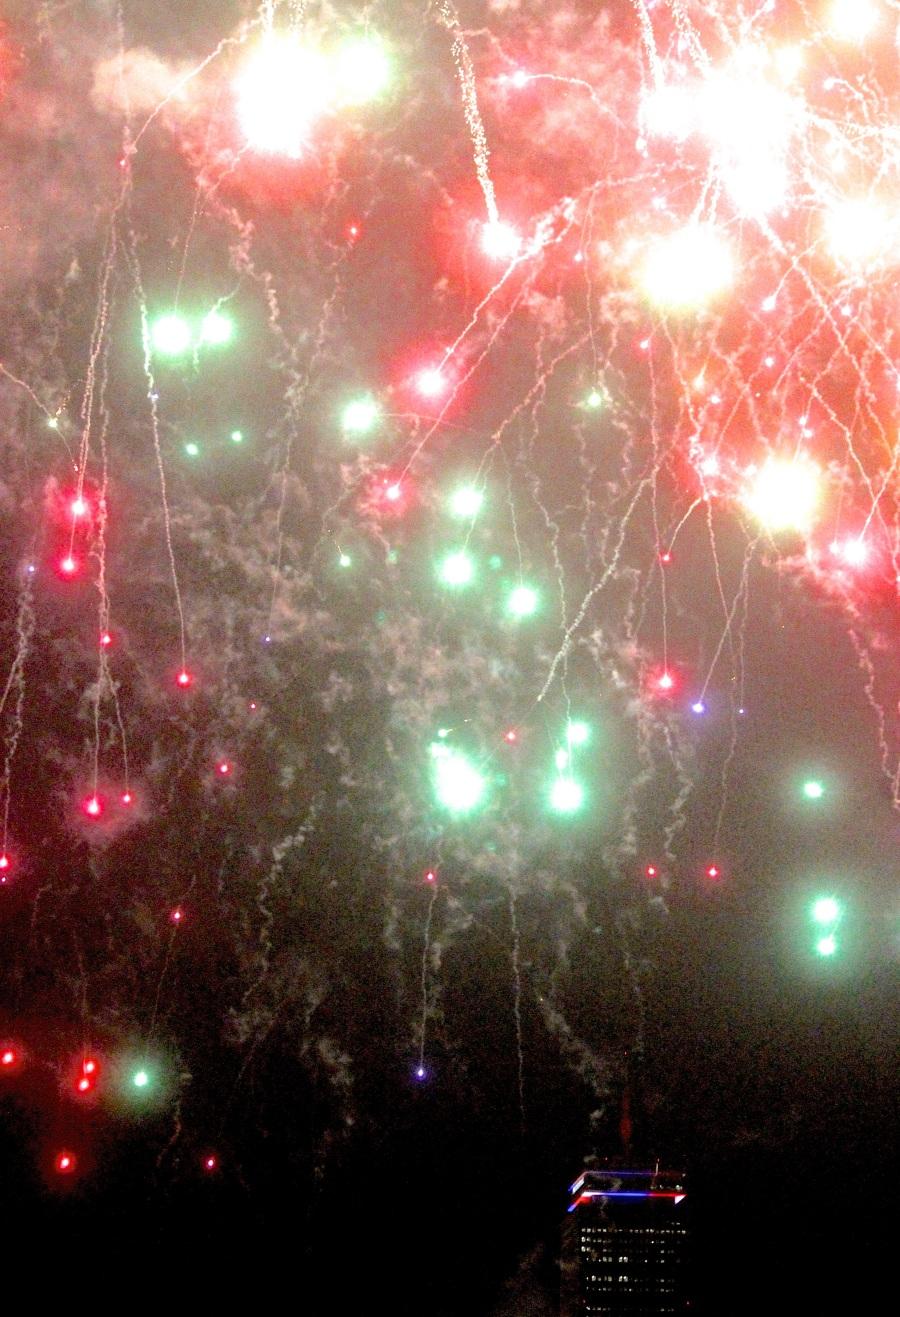 boston july 4 2013 fireworks 5